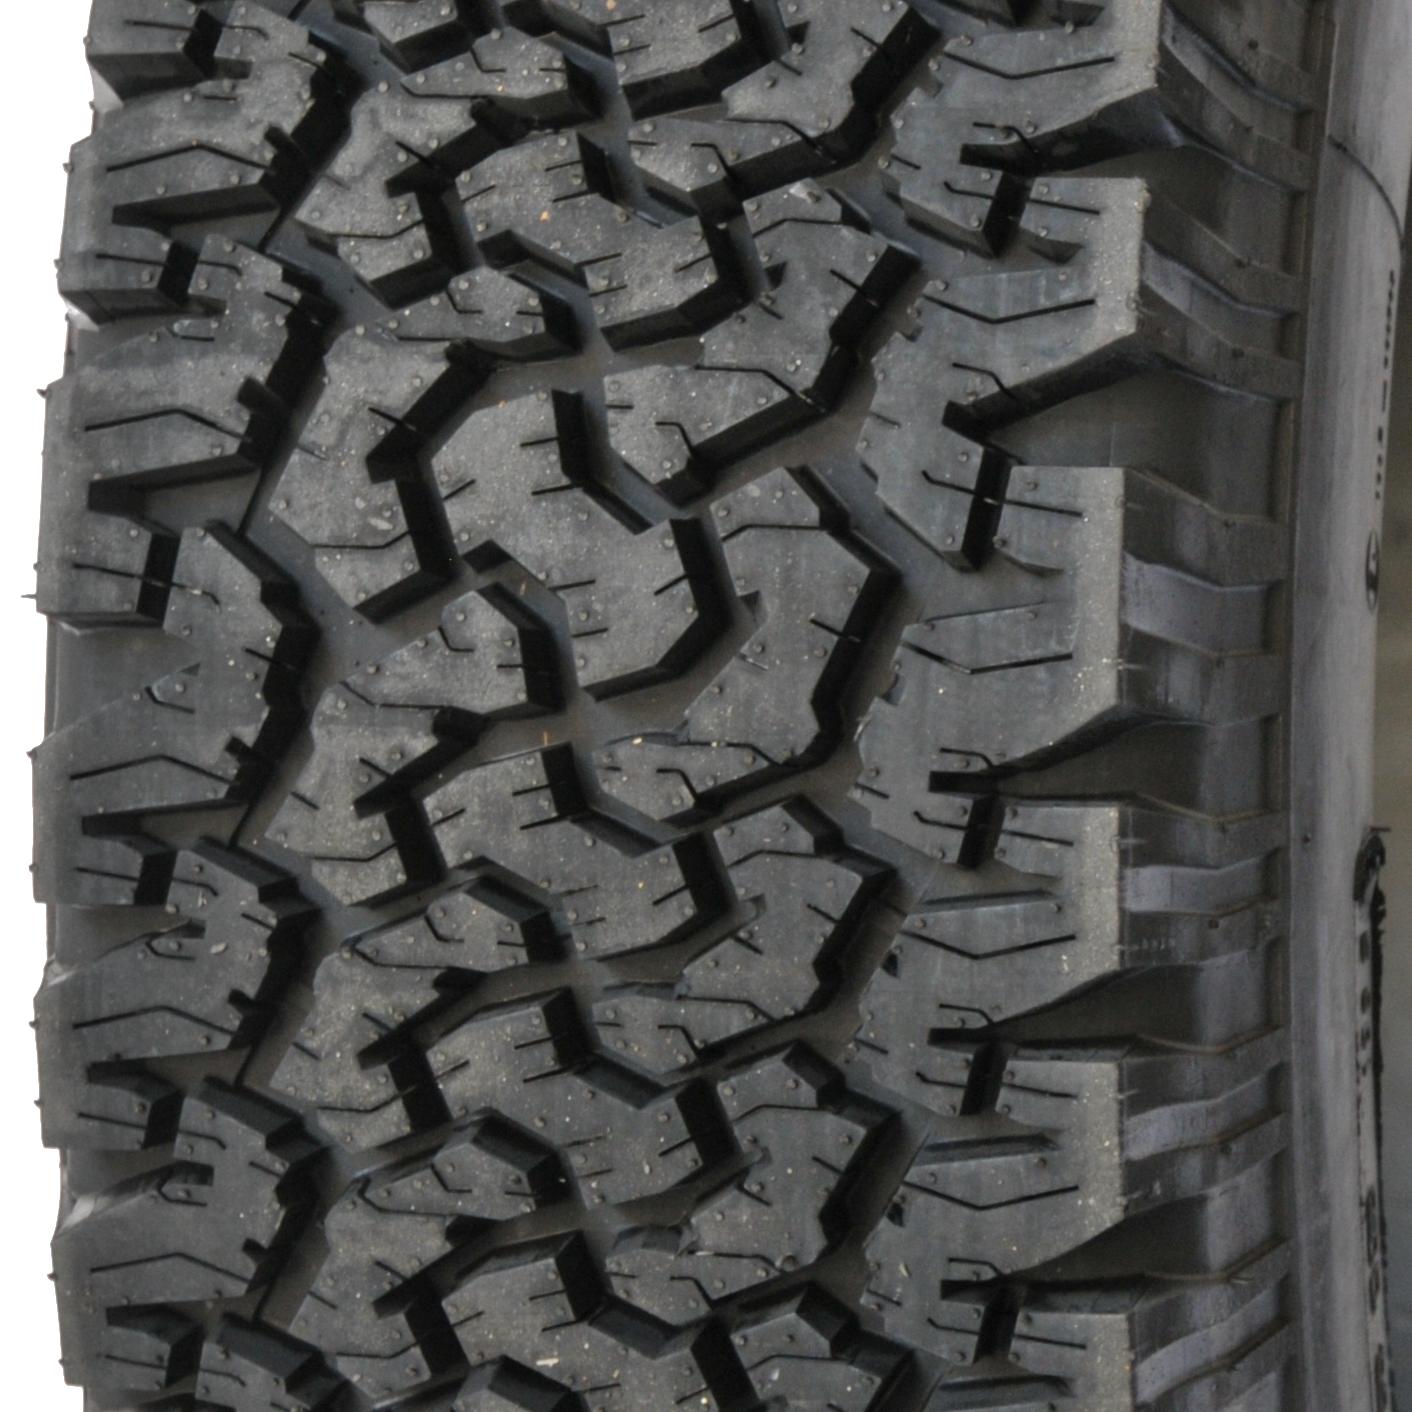 Off Road Tires For Trucks >> Pneus Ovada 4x4 Tires Bfg 255 65 R17